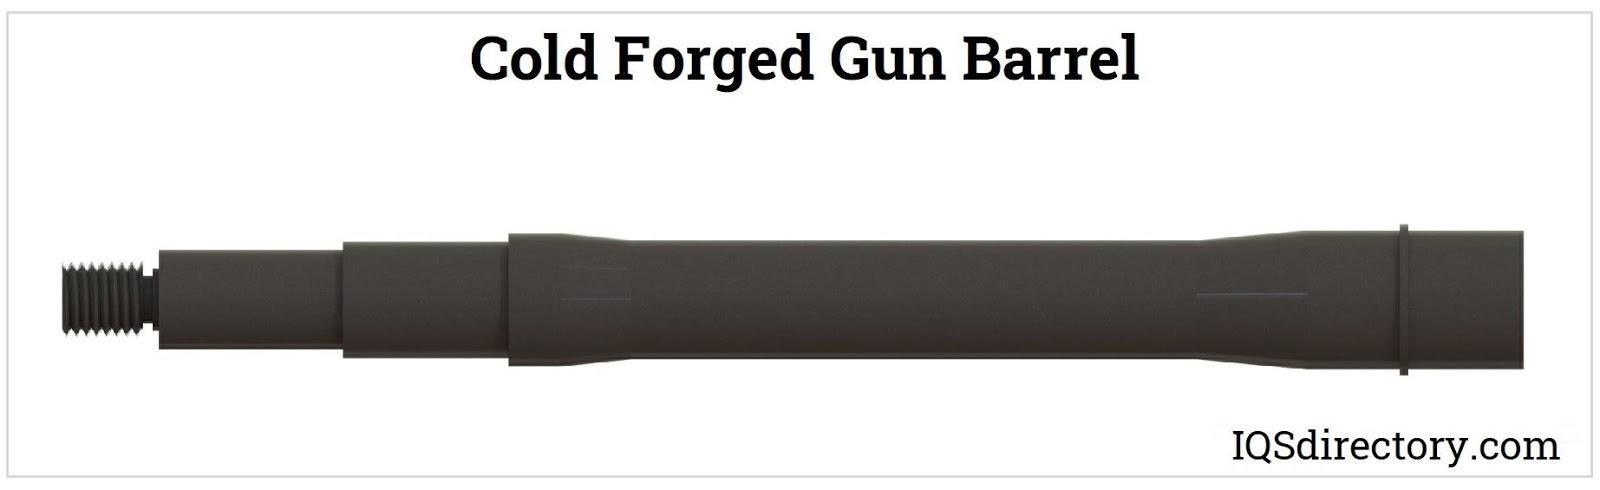 Cold Forged Gun Barrel